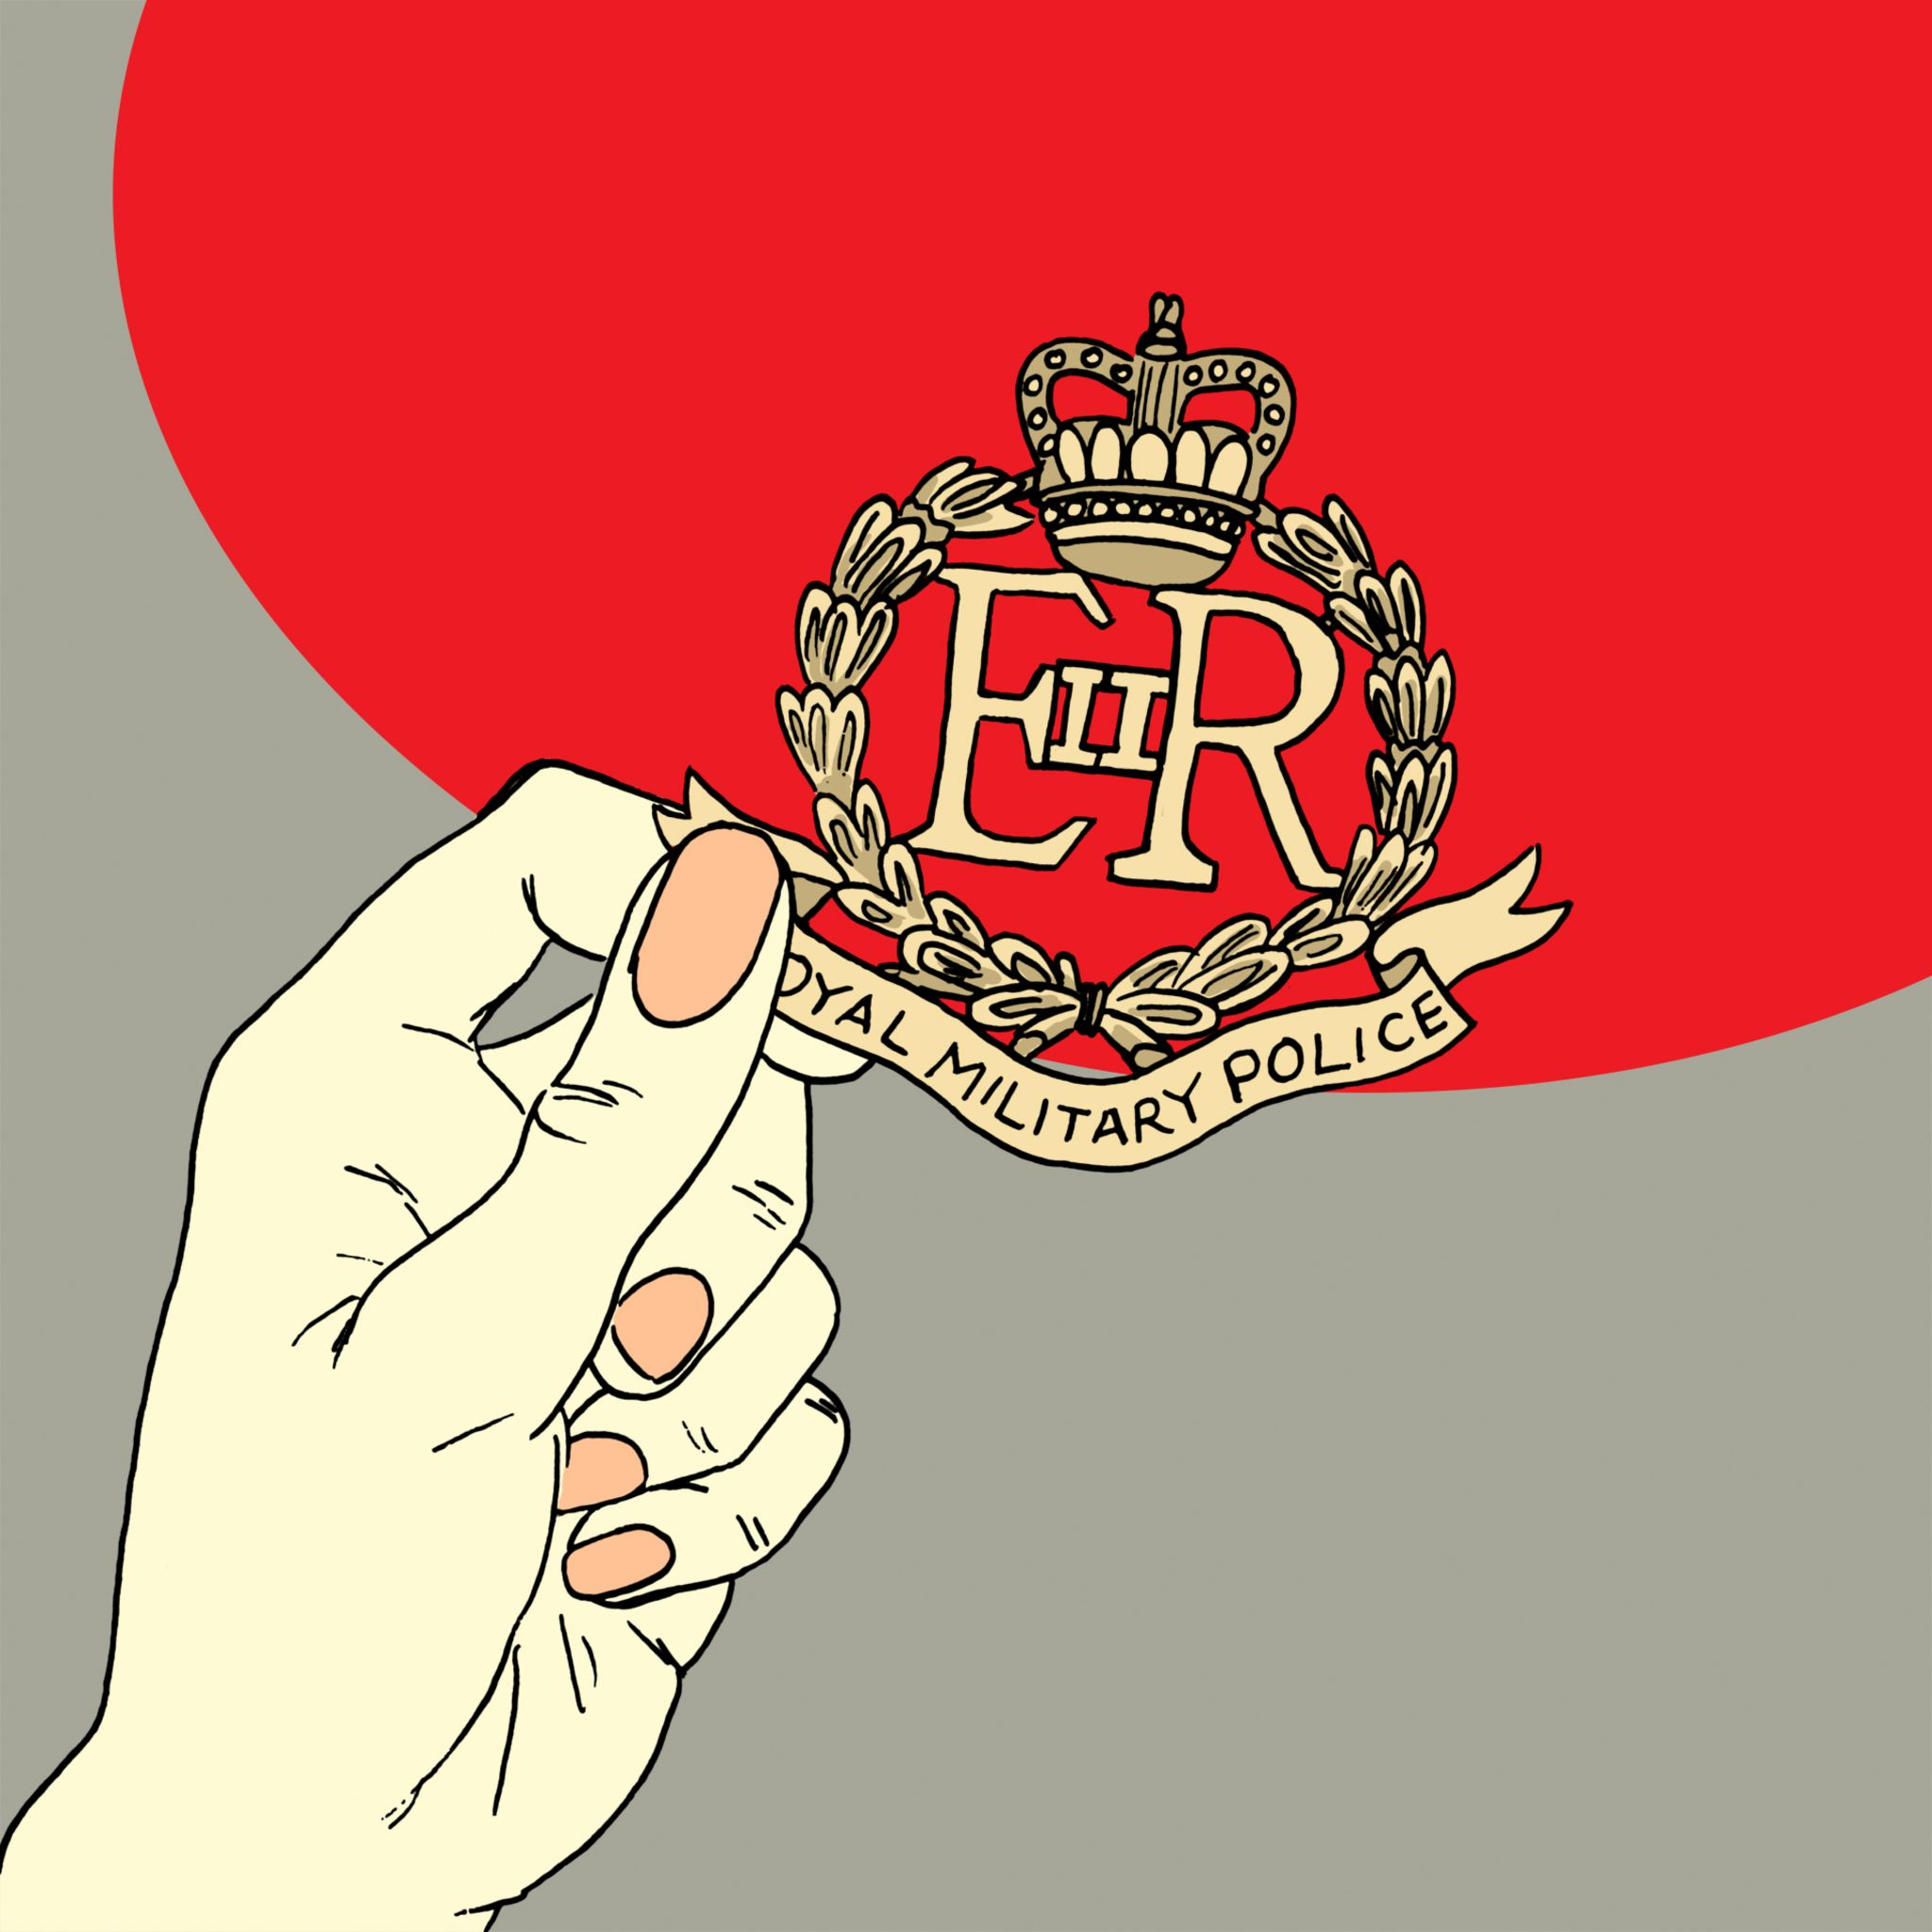 Military police badge